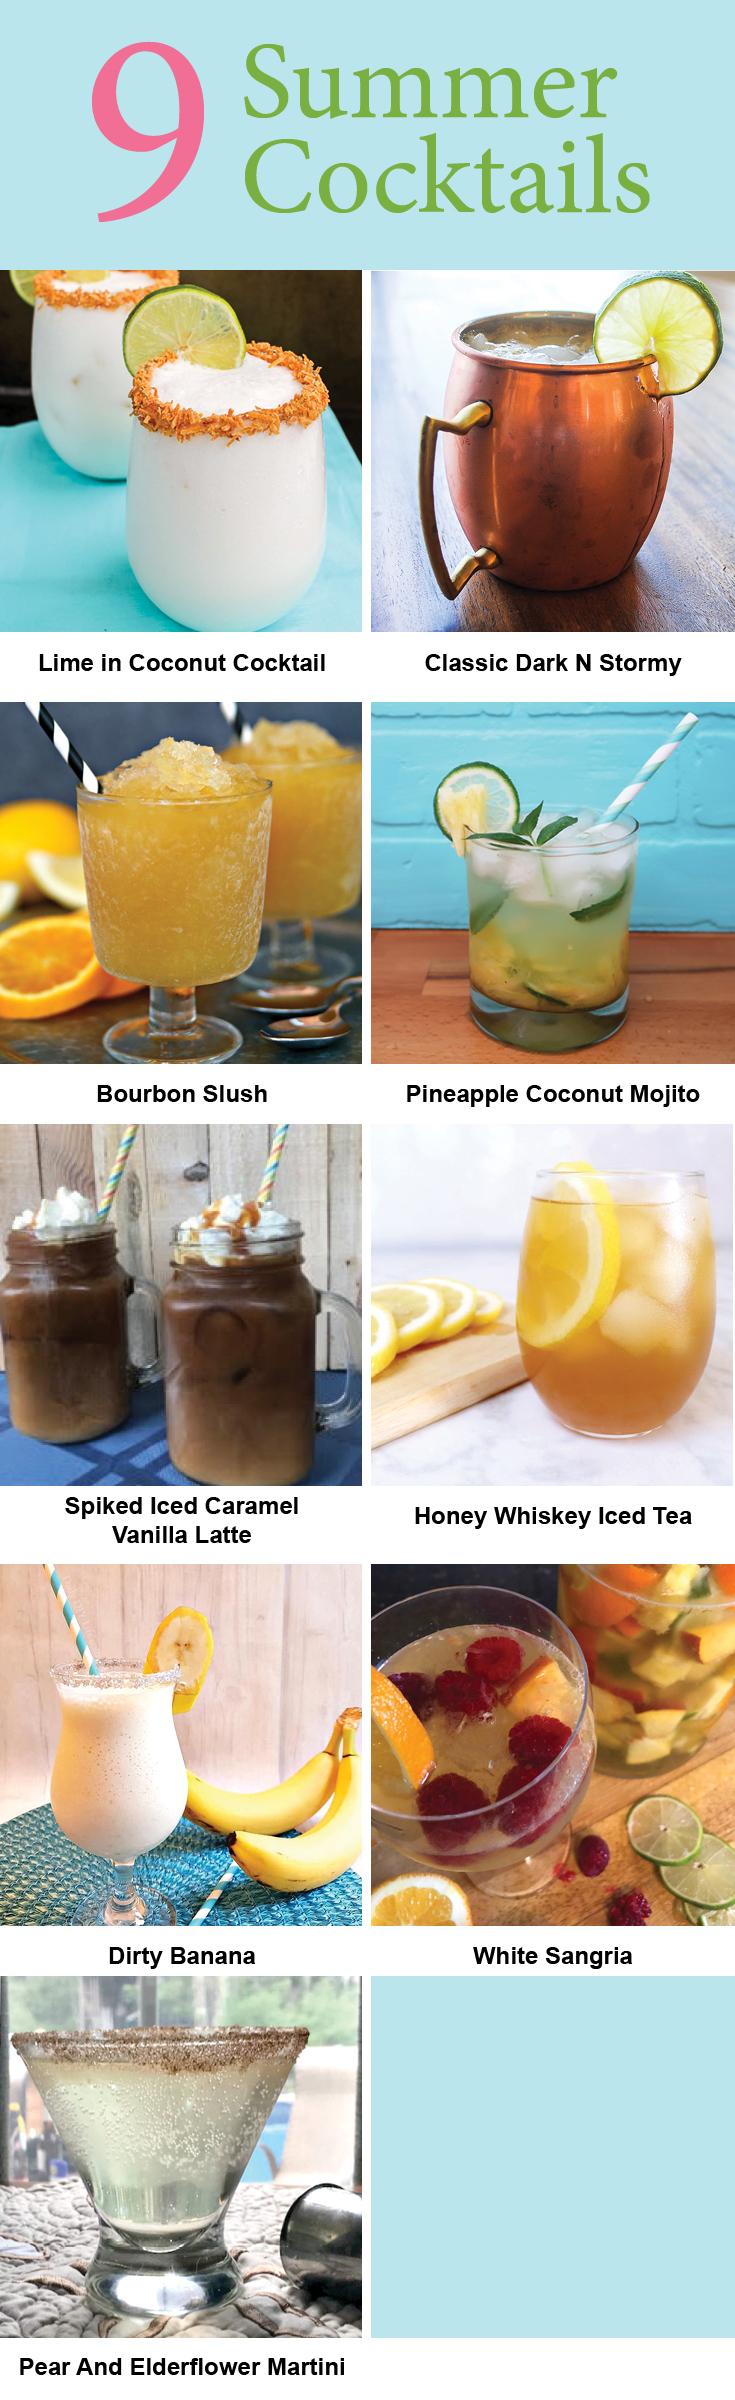 9_Summer_Cocktails.jpg